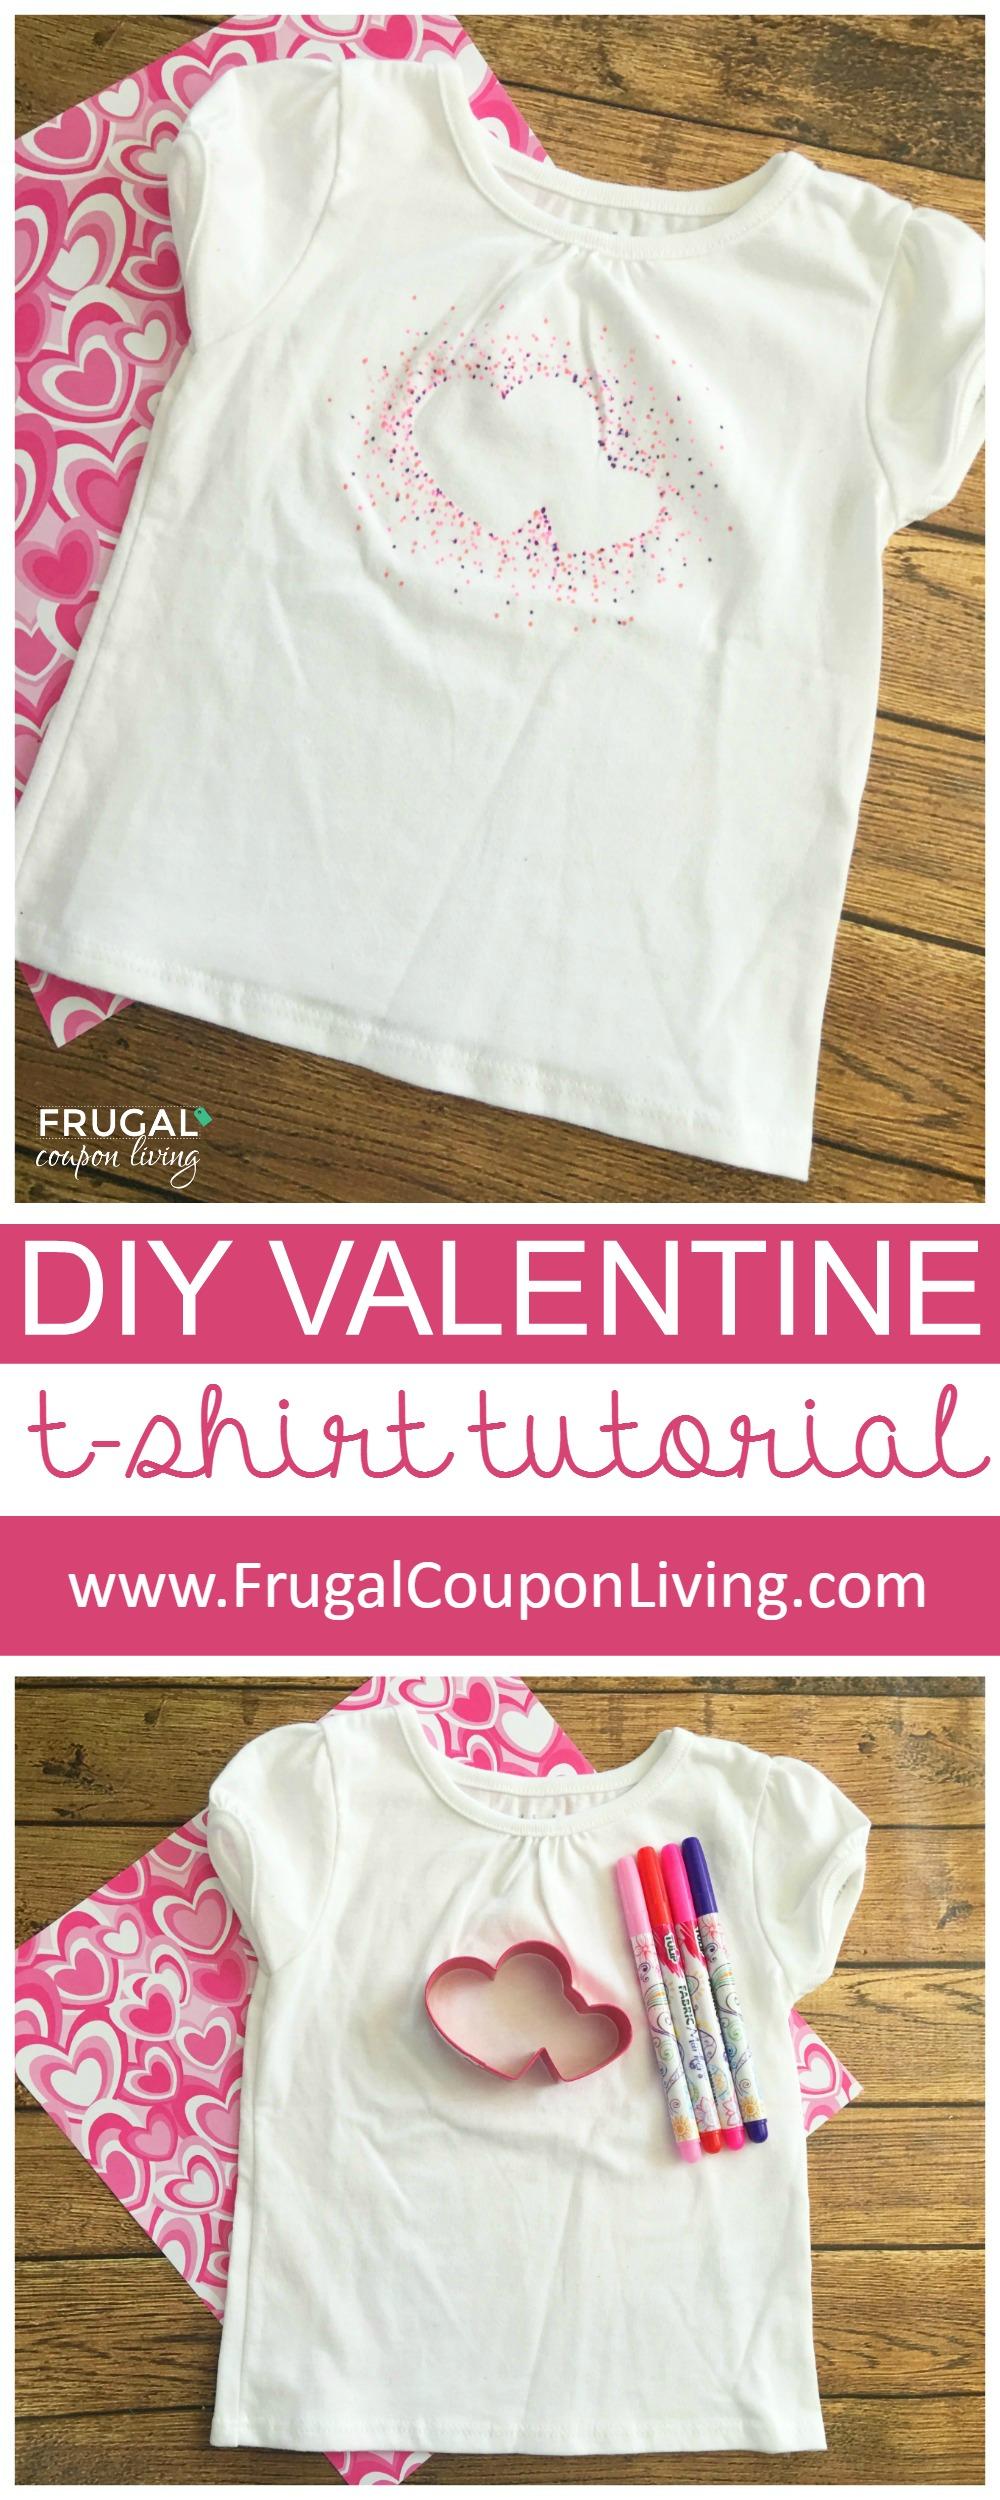 DIY-Valentine-Shirt-Collage-frugal-coupon-living